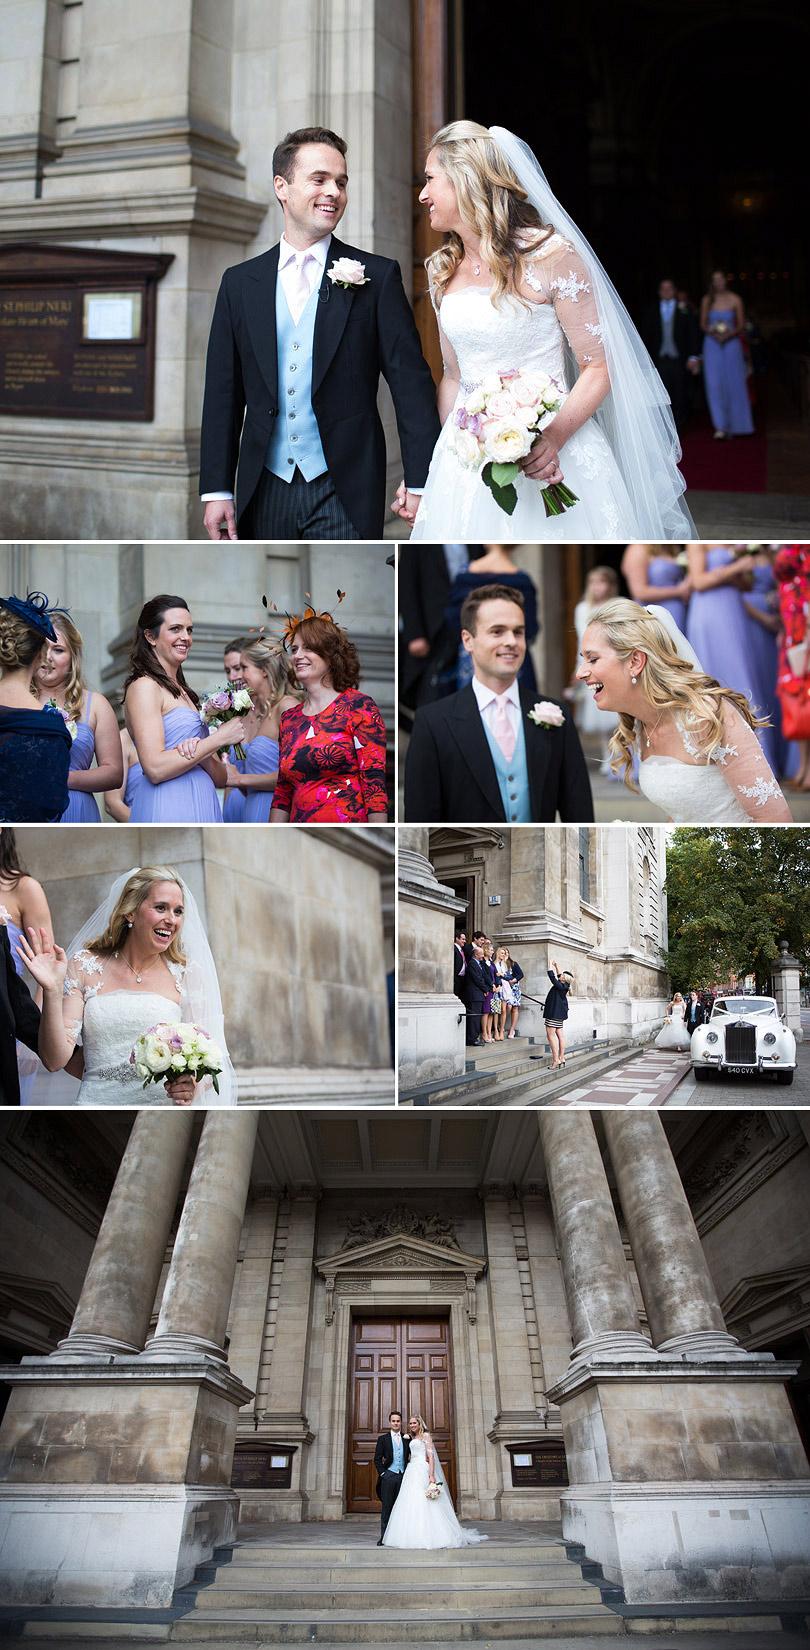 Brompton-Oratory-Lincolns-Inn-Wedding-RachelMax-011.jpg